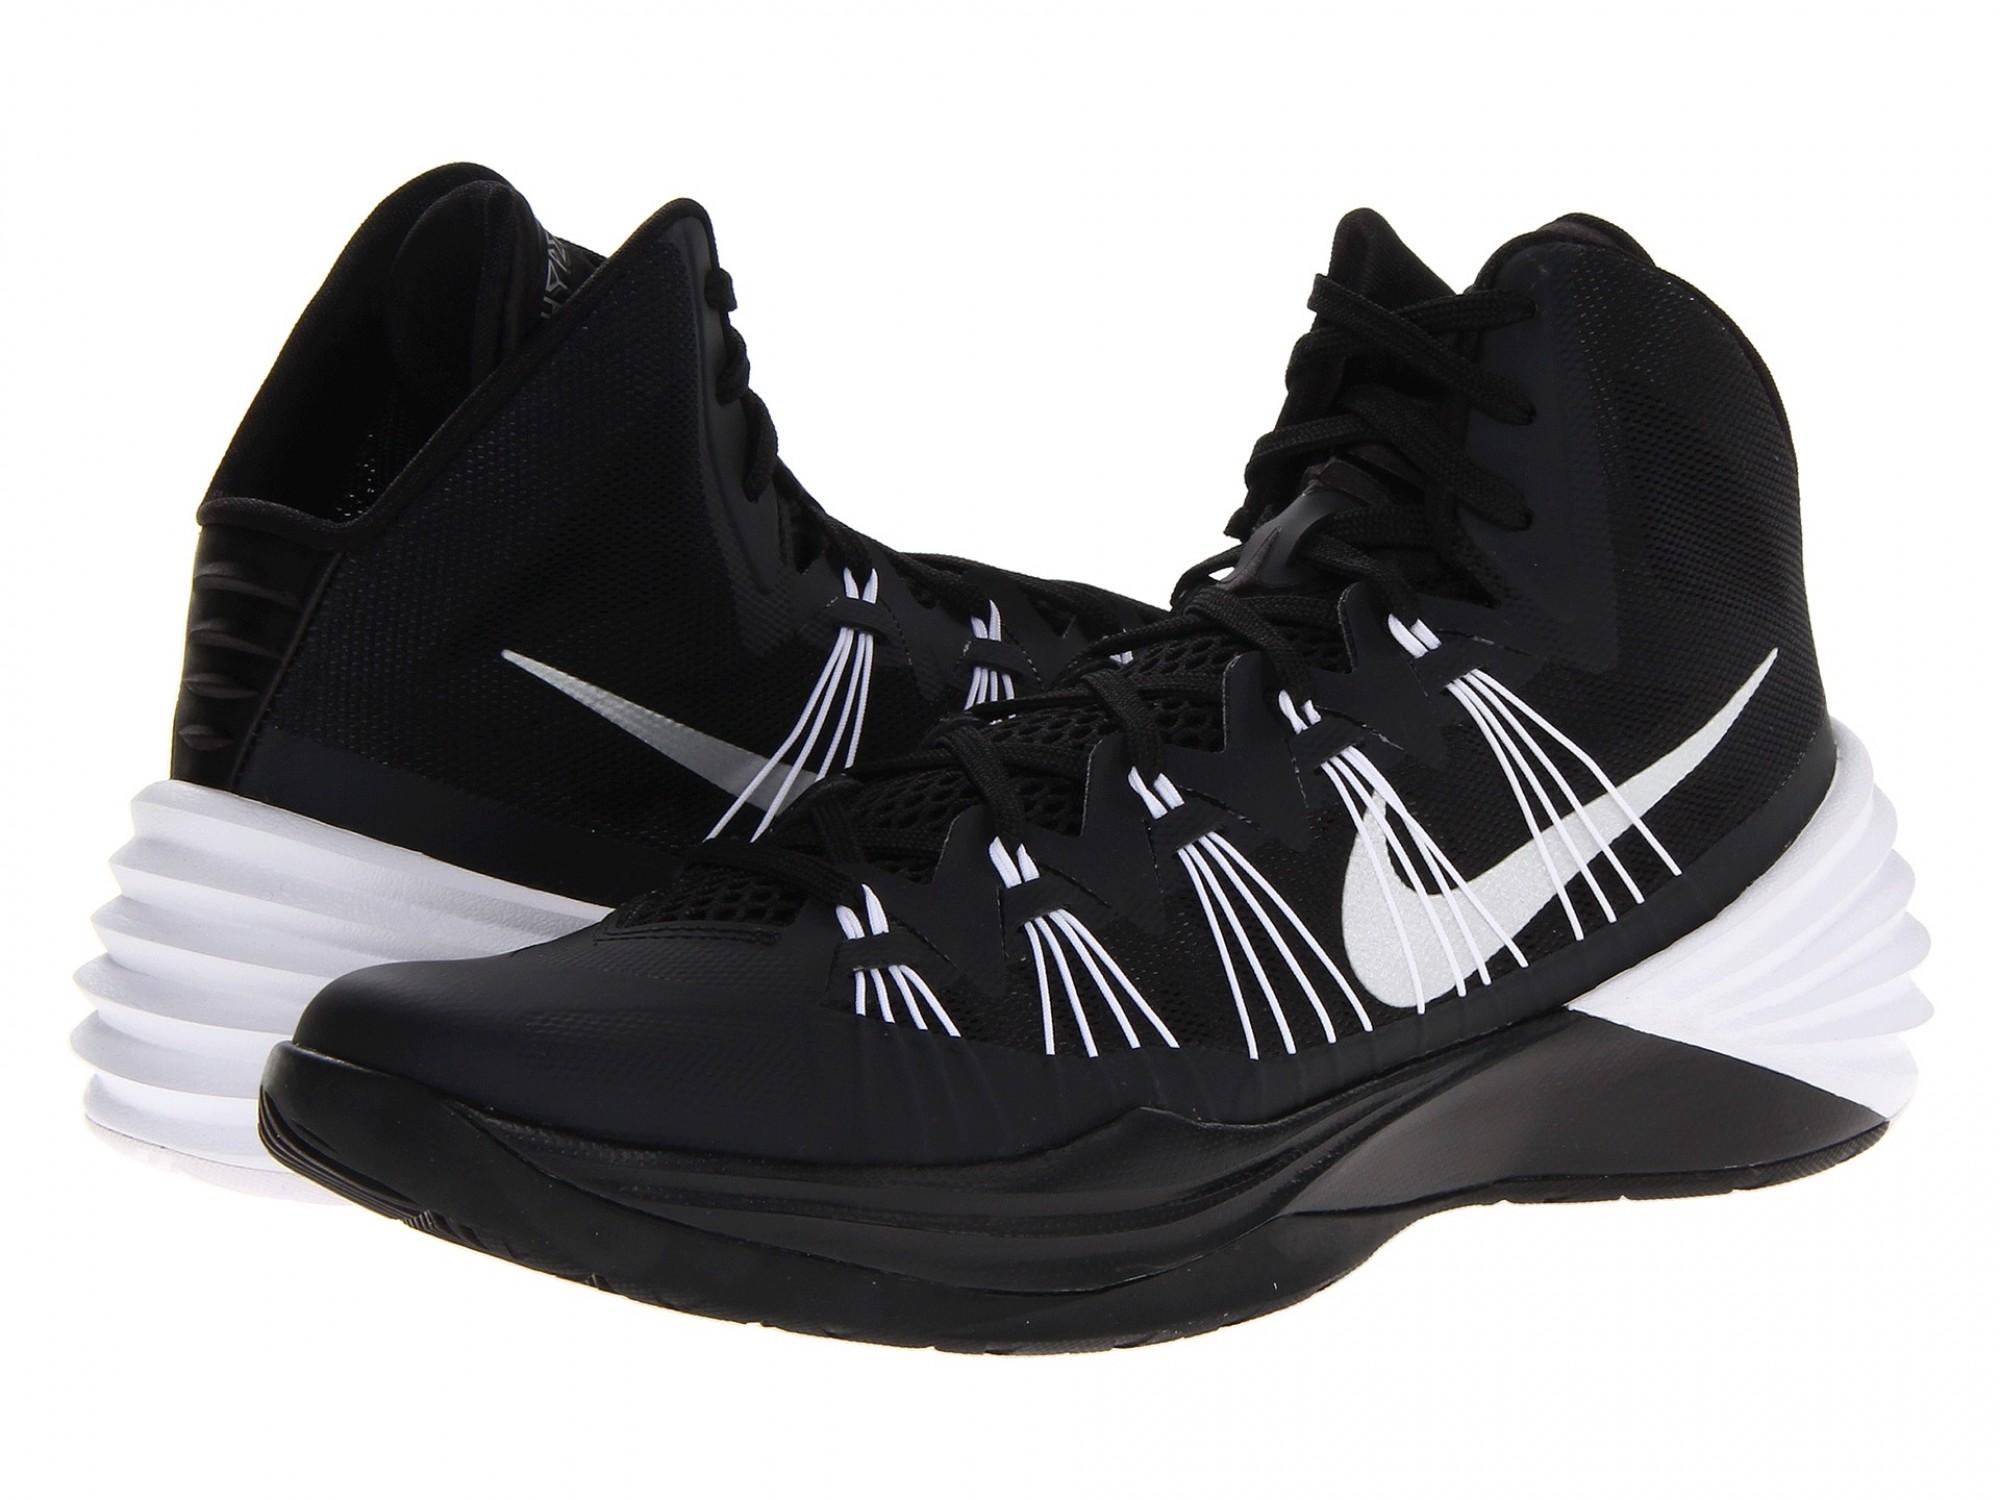 Nike Hyperdunk 2013 (Black/ Metallic) - купить в Украине ...